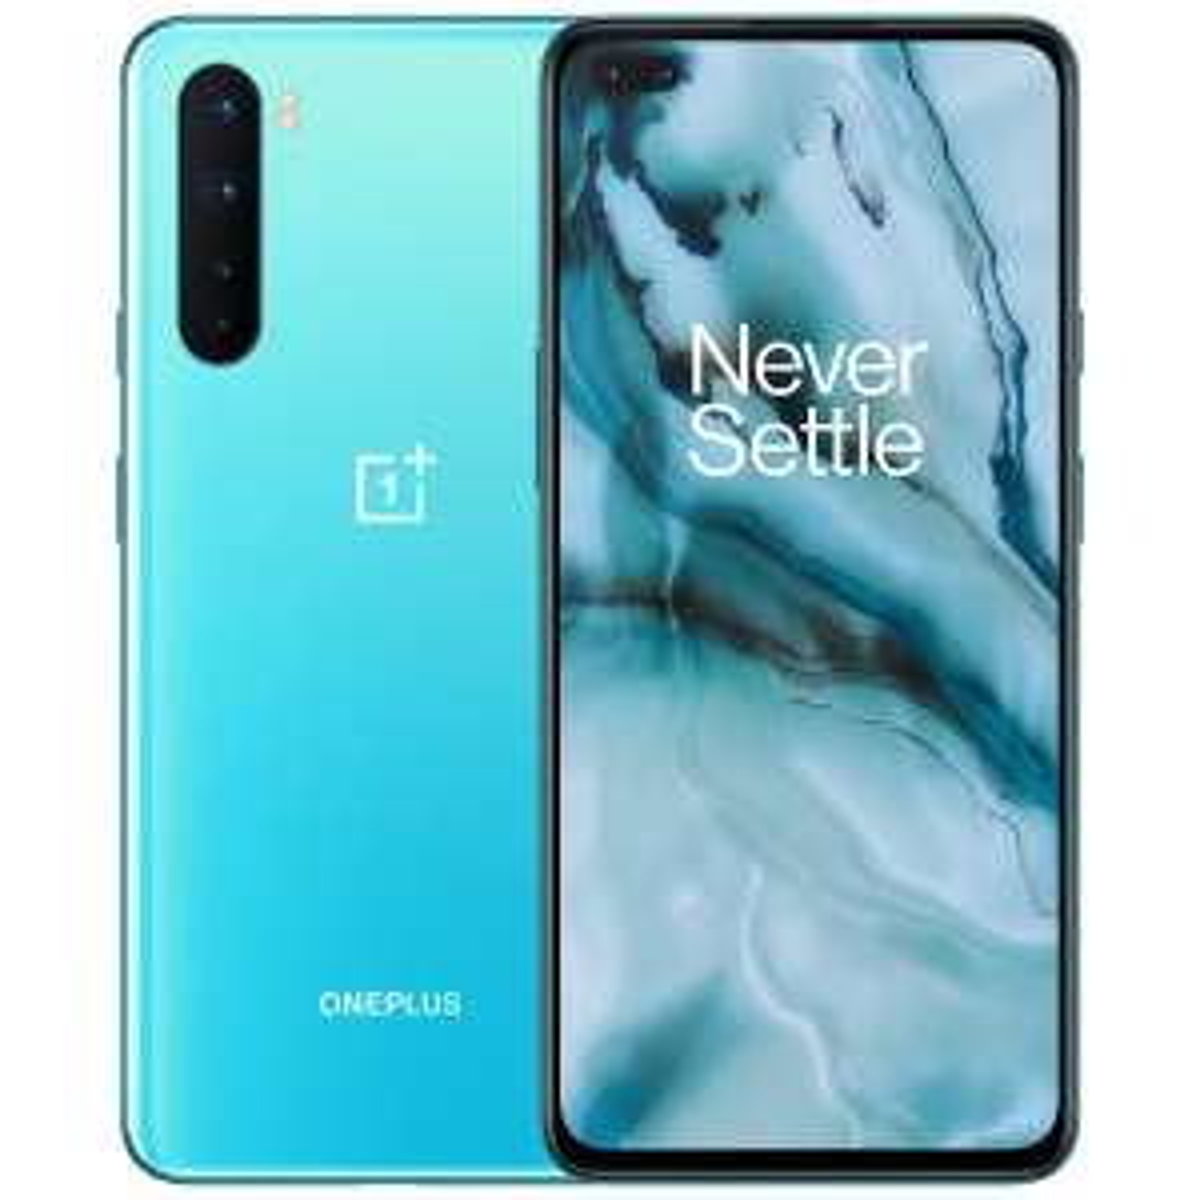 "Smartphone 6.44"" OnePlus Nord - 5G, Full HD+ 90 Hz, Snapdragon 765G, RAM 8 Go, 128 Go, Bleu (335.99€ avec RAKUTEN30 +36.60€ en SuperPoints)"